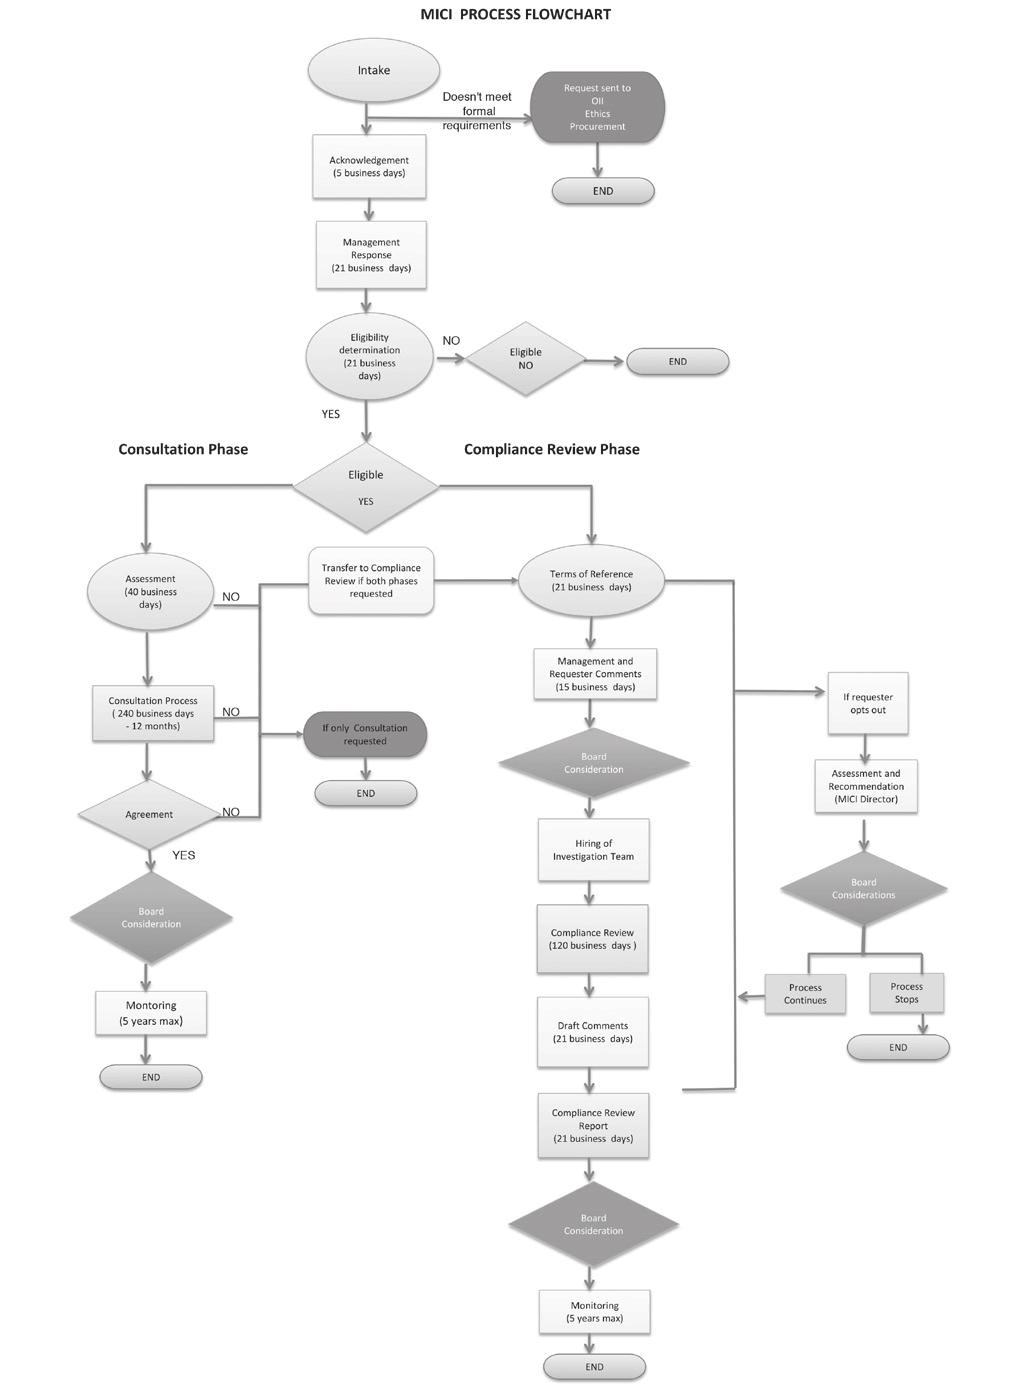 MICI Process Flowchart